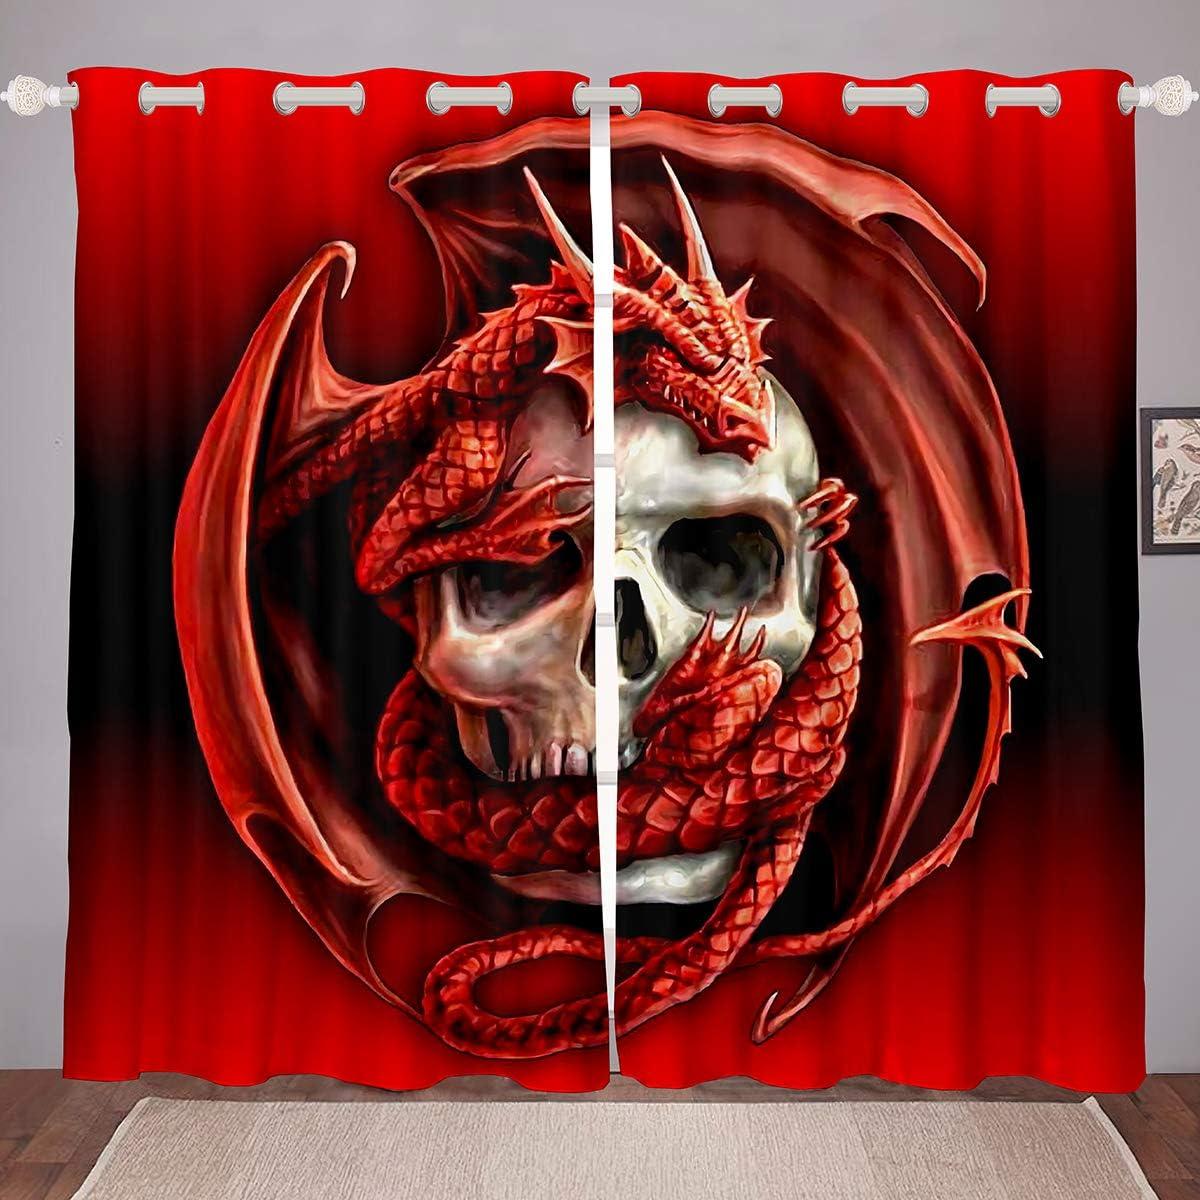 Erosebridal Skull Window Curtains Red Dragon Blackout Curtains Teens Boys Kids Gothic Sugar Skull Decor Window Drapes Terror Animal Dragon Skeleton Pattern Darkening Thermal Drapes 2 Panels 38